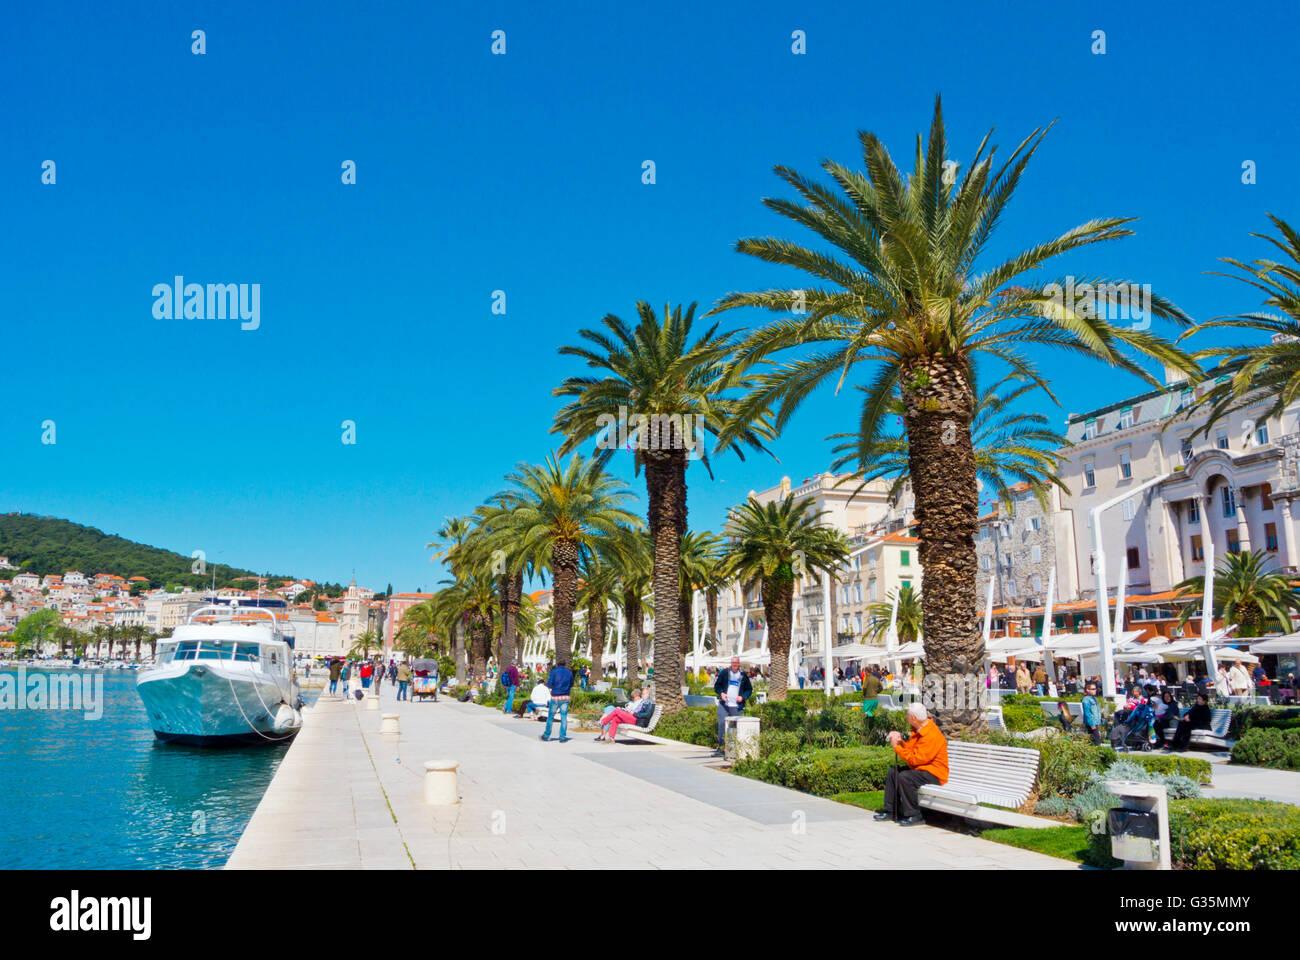 Riva, seaside promenade, Split, Dalmatia, Croatia - Stock Image